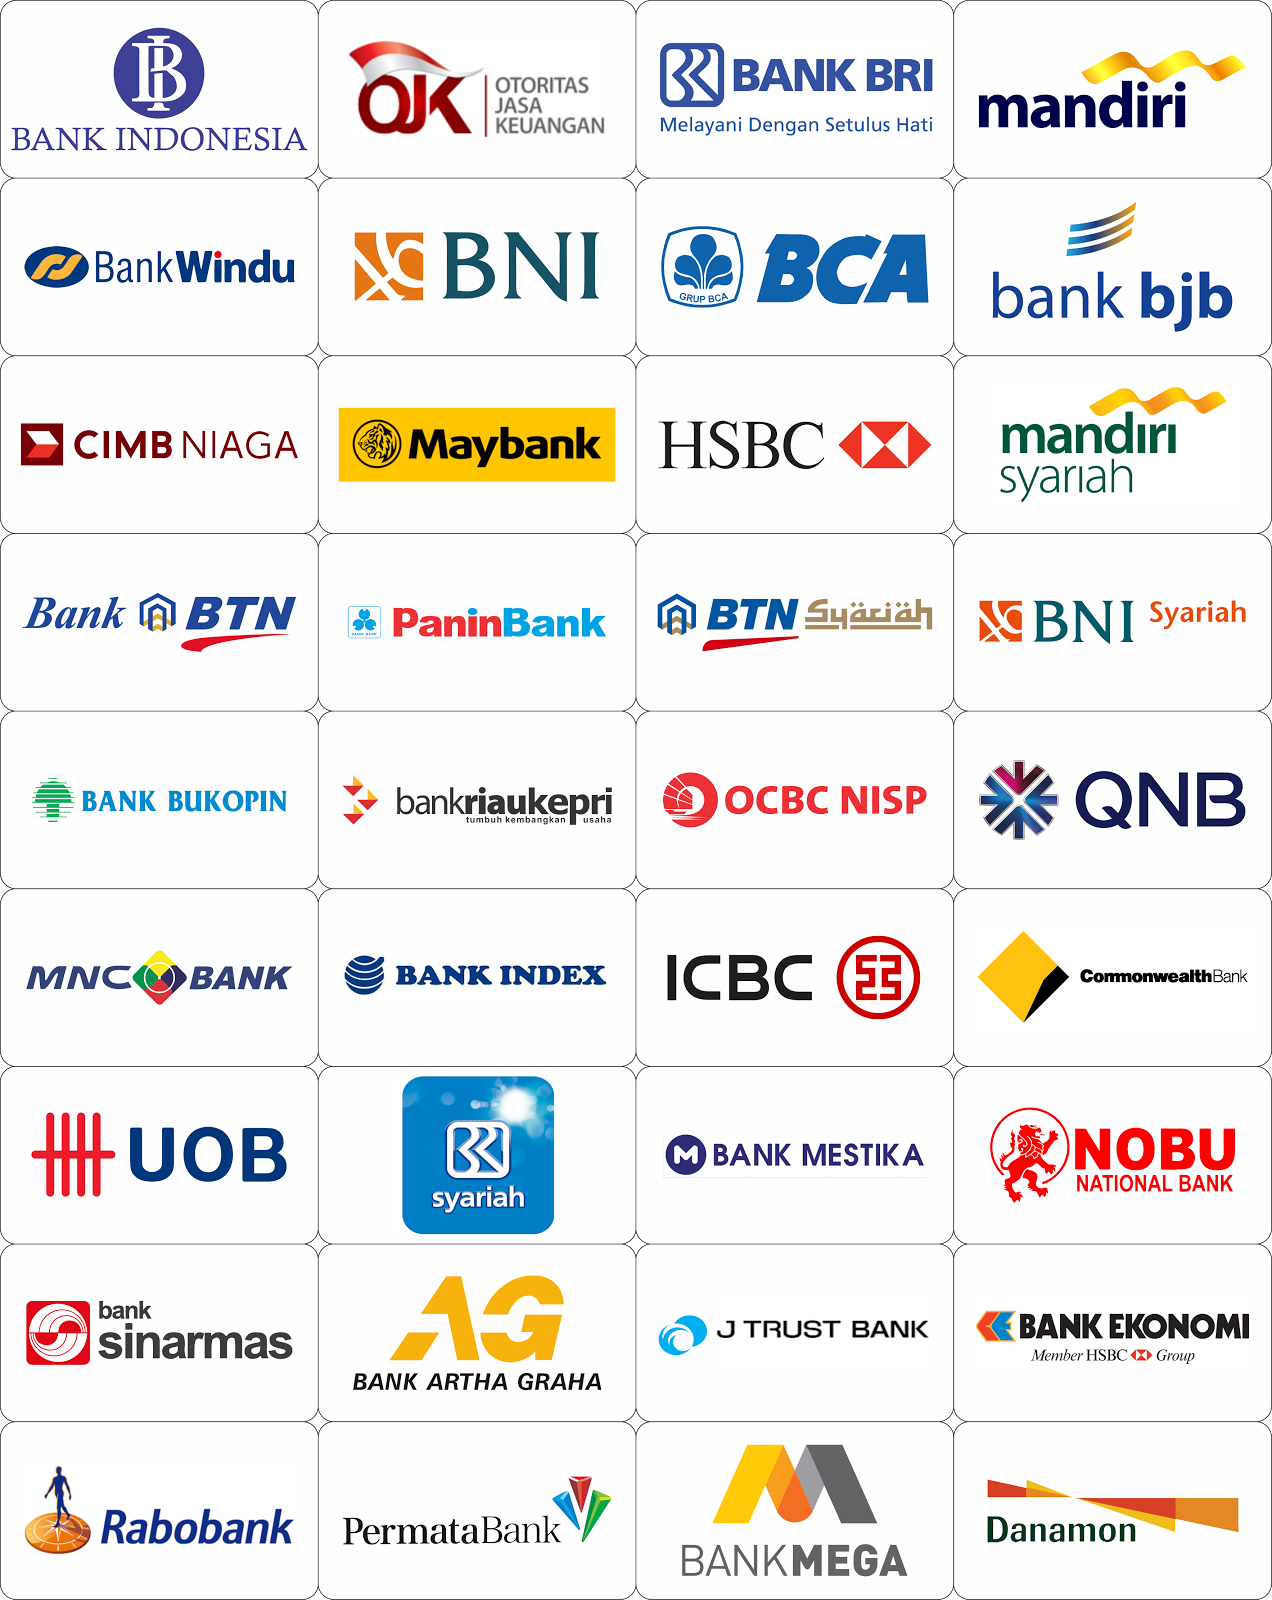 Kumpulan logo-logo bank di indonesia coreldraw vector